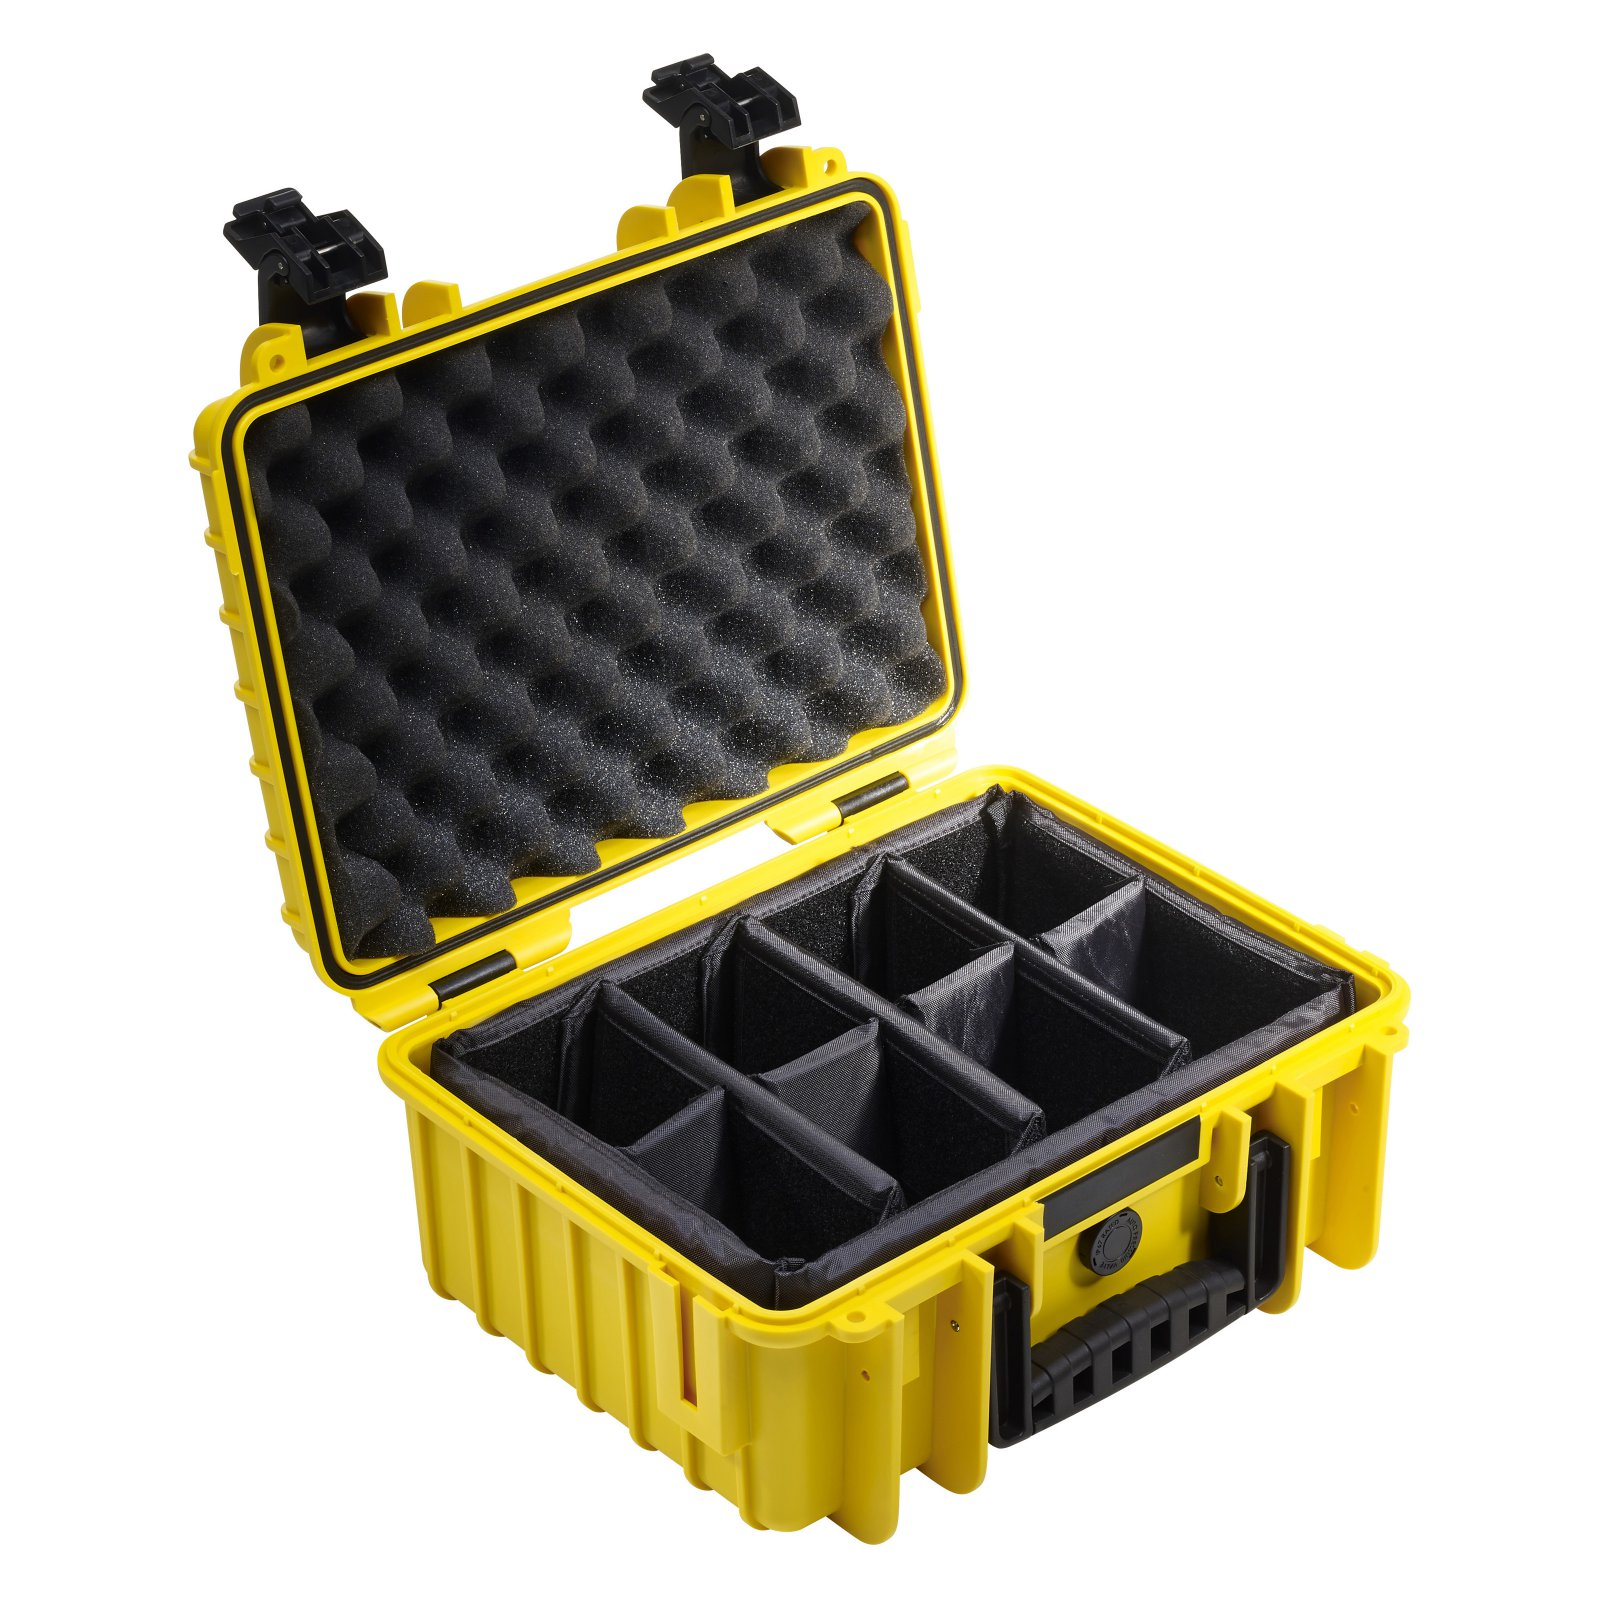 B&W B and W Type 3000 Waterproof Outdoor Storage Case